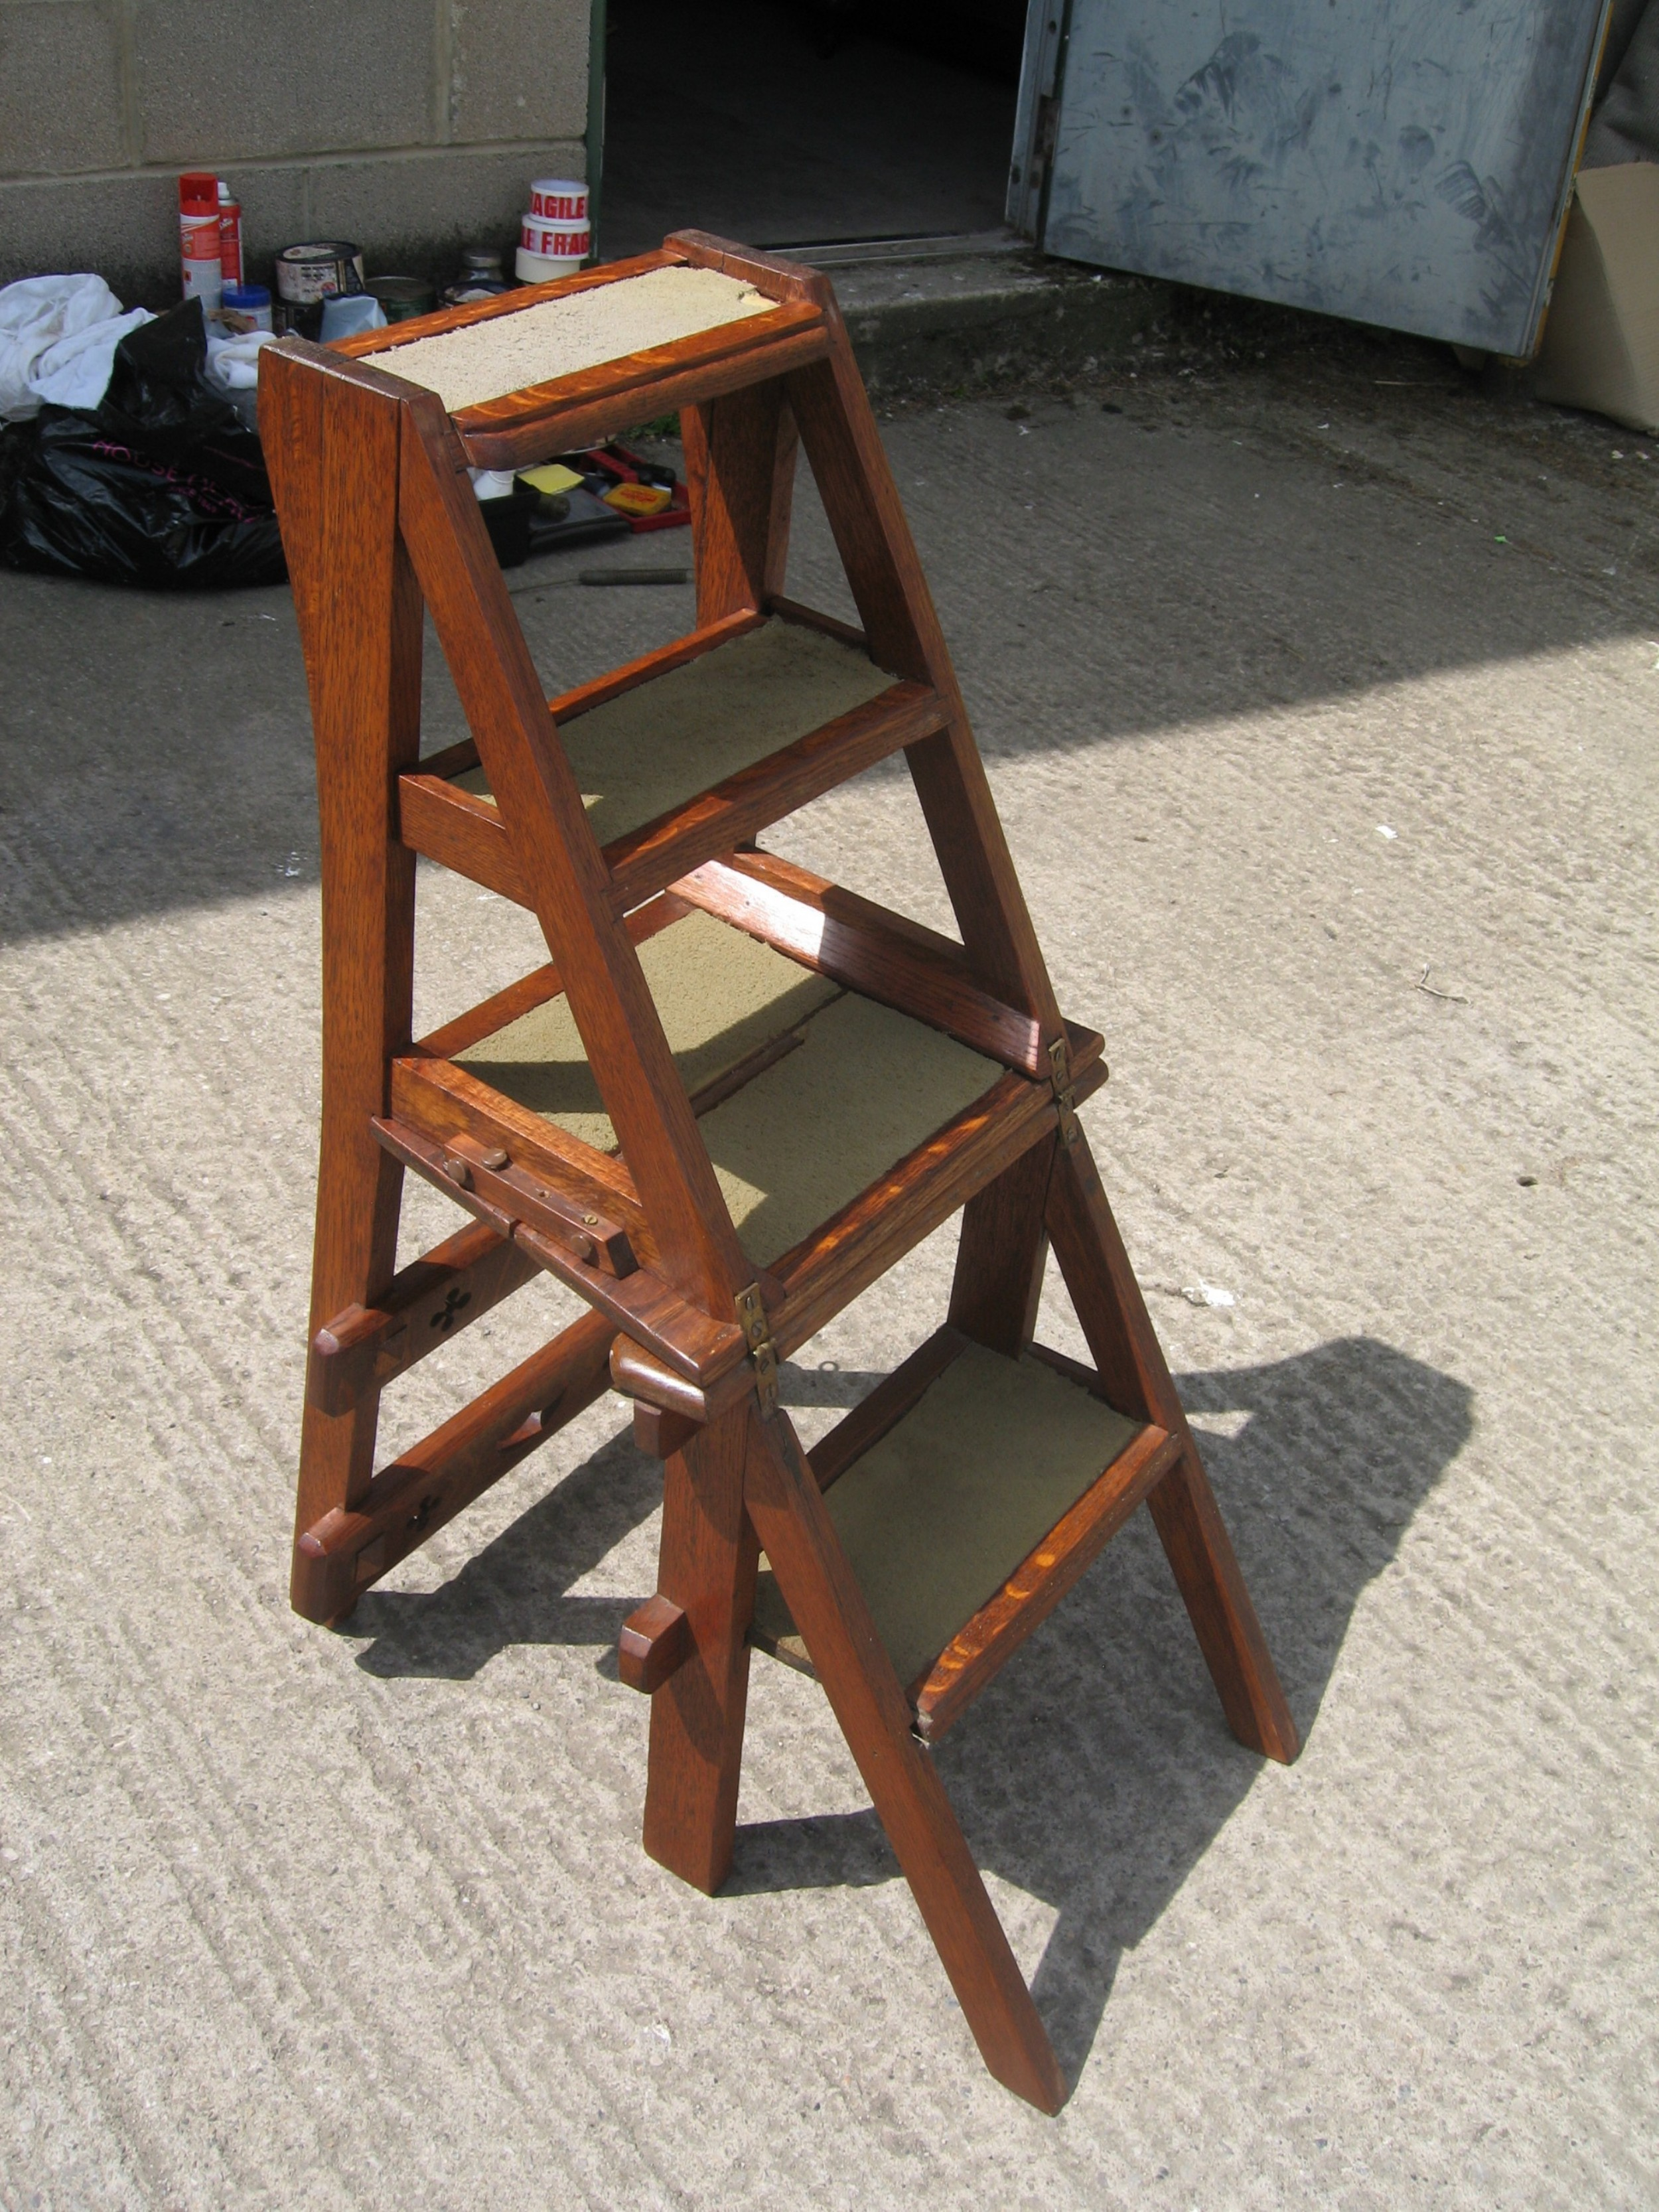 Pleasing Victorian Oak Folding Chair Steps 546892 Sellingantiques Alphanode Cool Chair Designs And Ideas Alphanodeonline